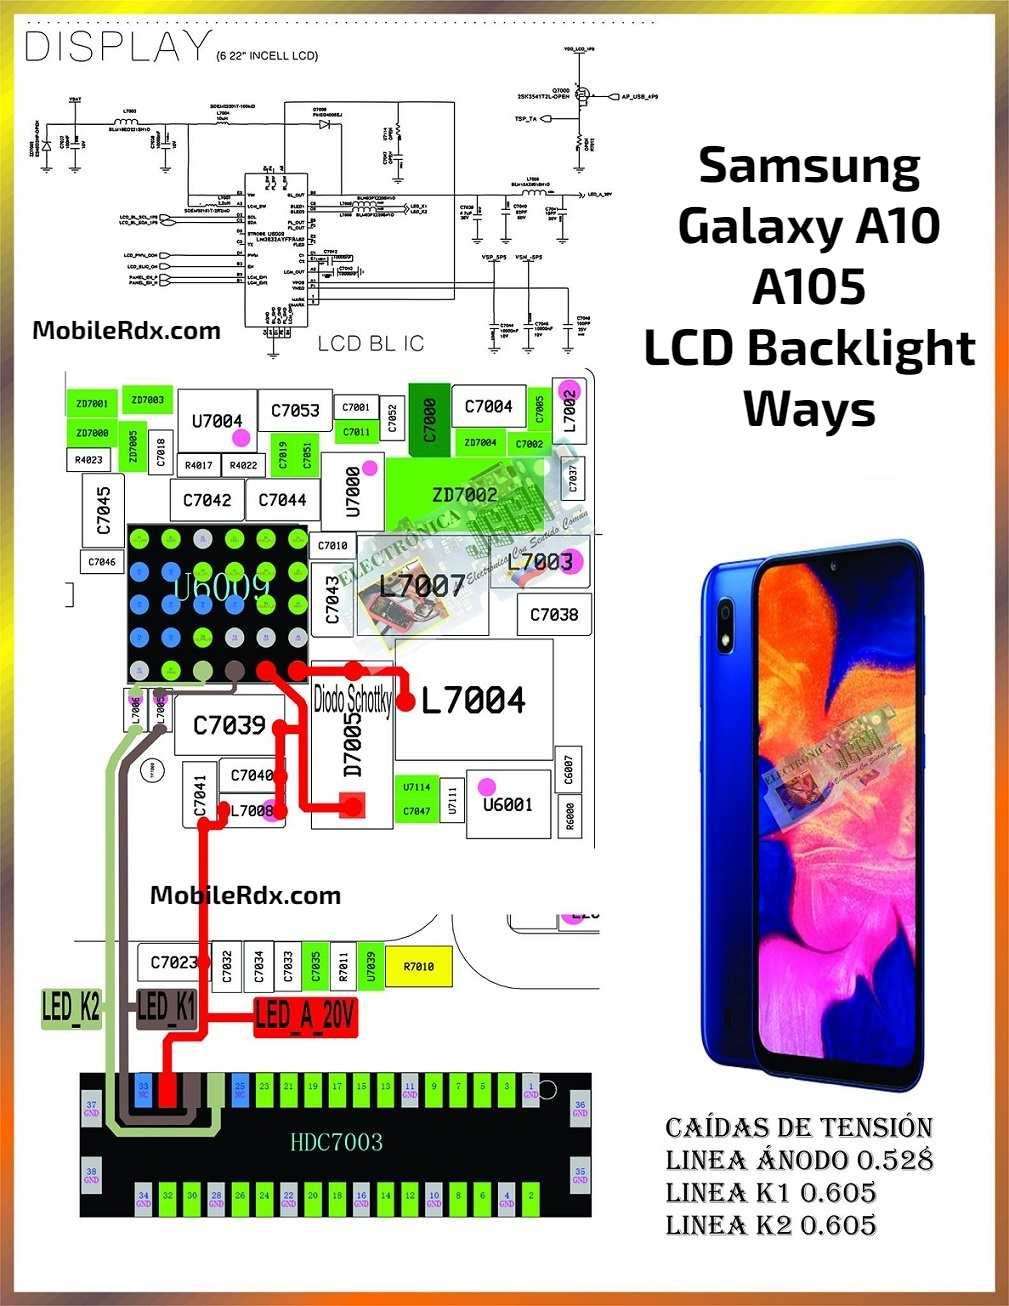 Samsung Galaxy A10 A105 LCD Backlight Ways Display Light Solution